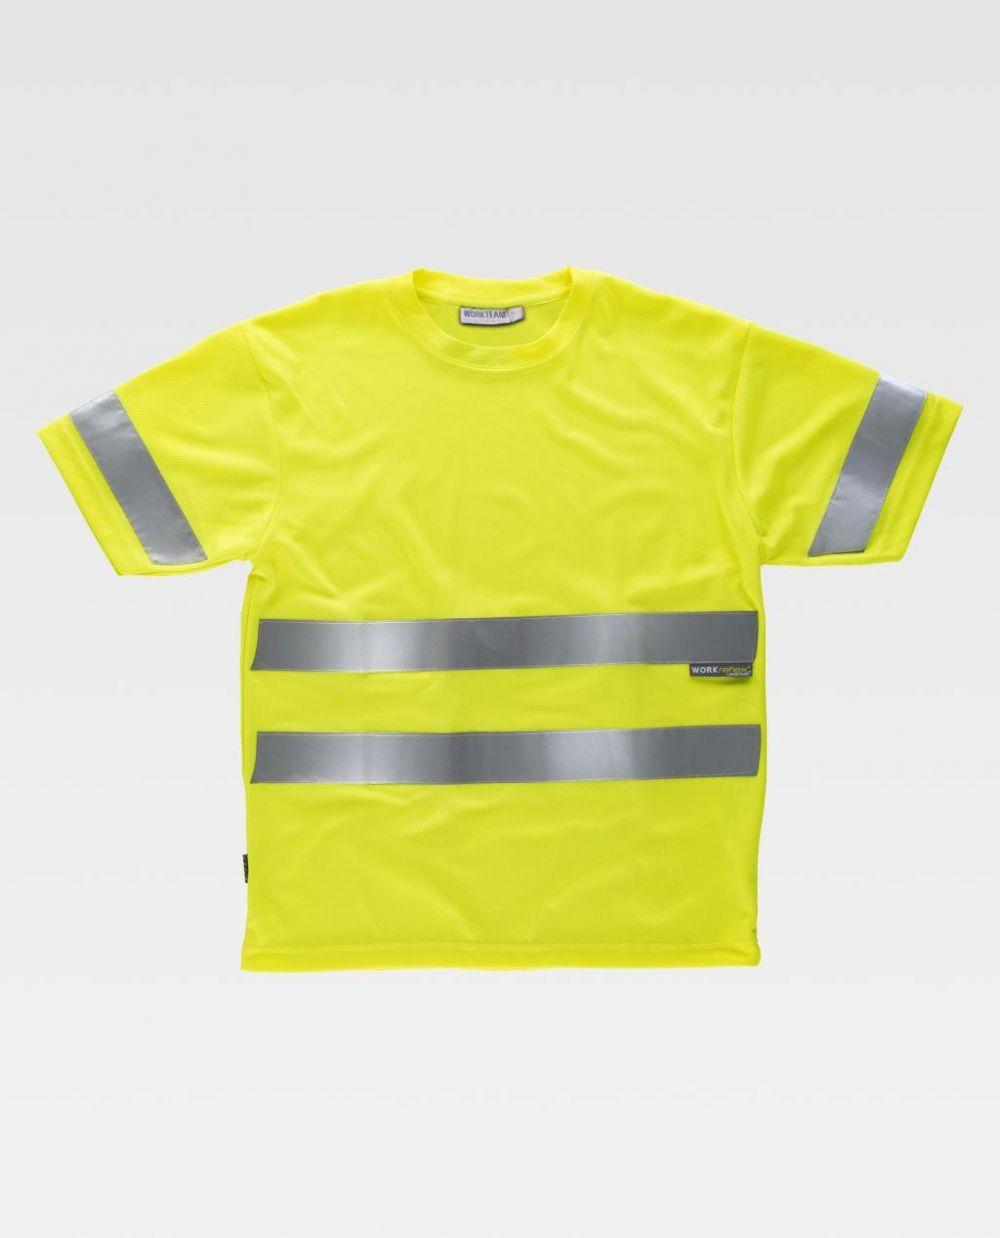 Camisetas reflectante workteam alta visbilidad mc con cintas reflectantes vista 1